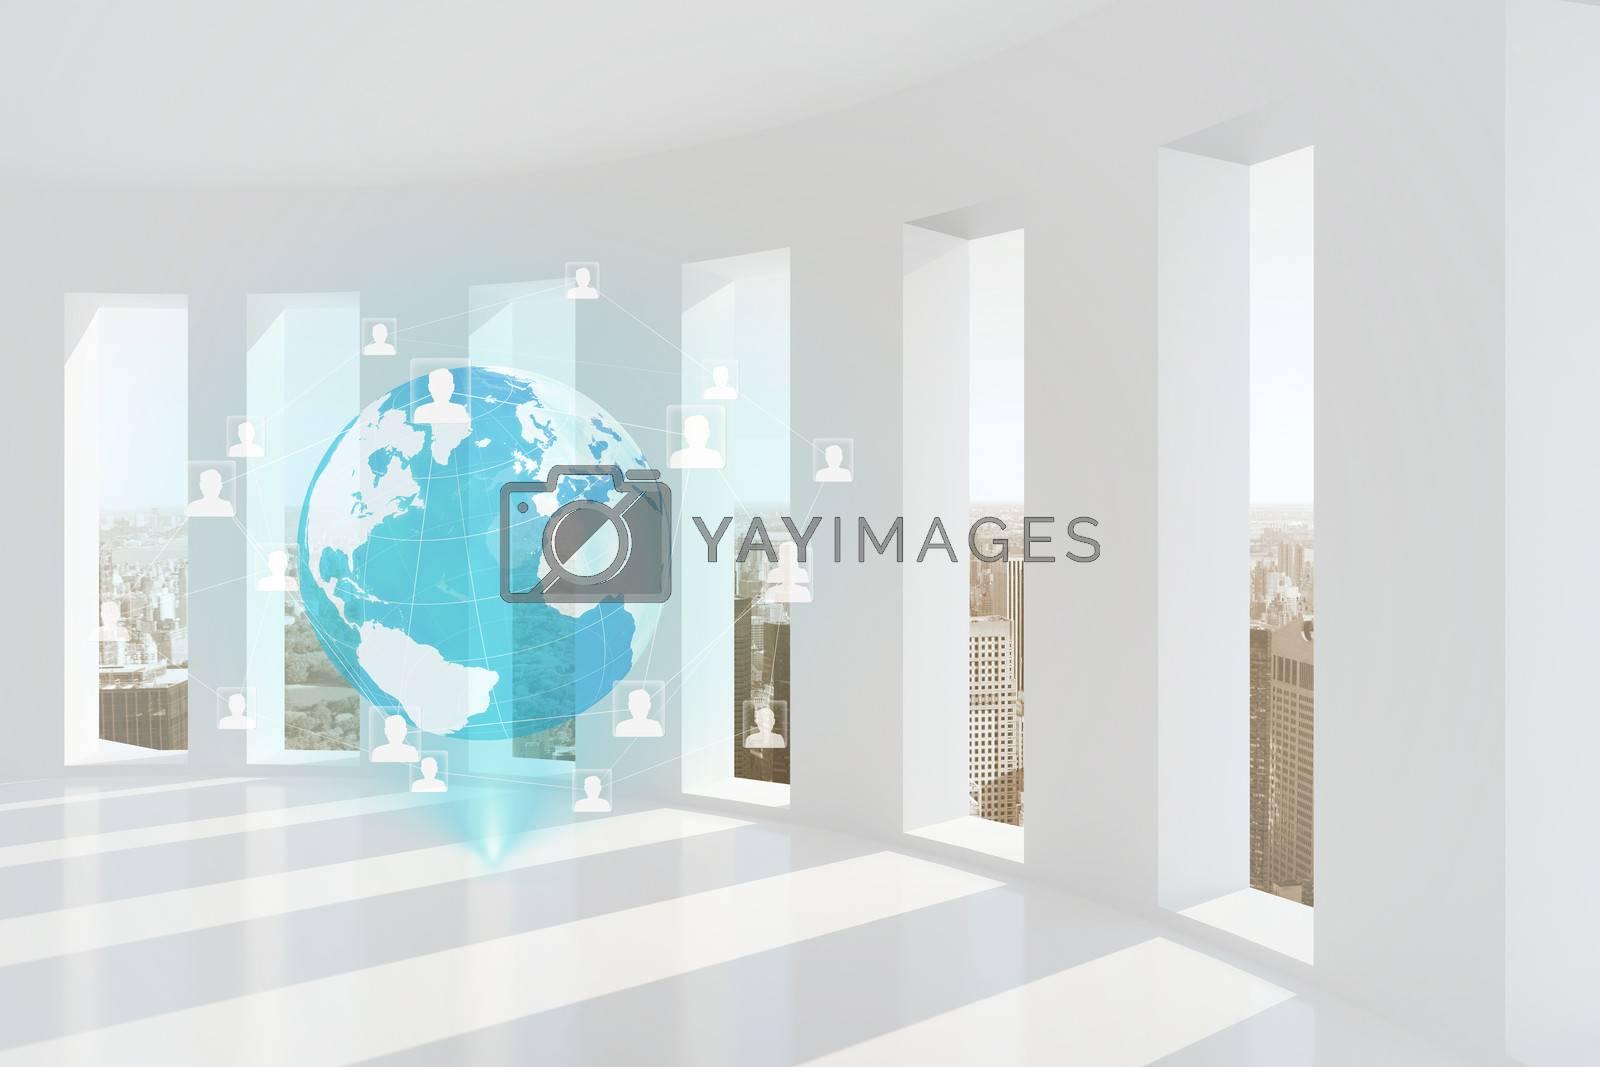 Global business hologram by Wavebreakmedia